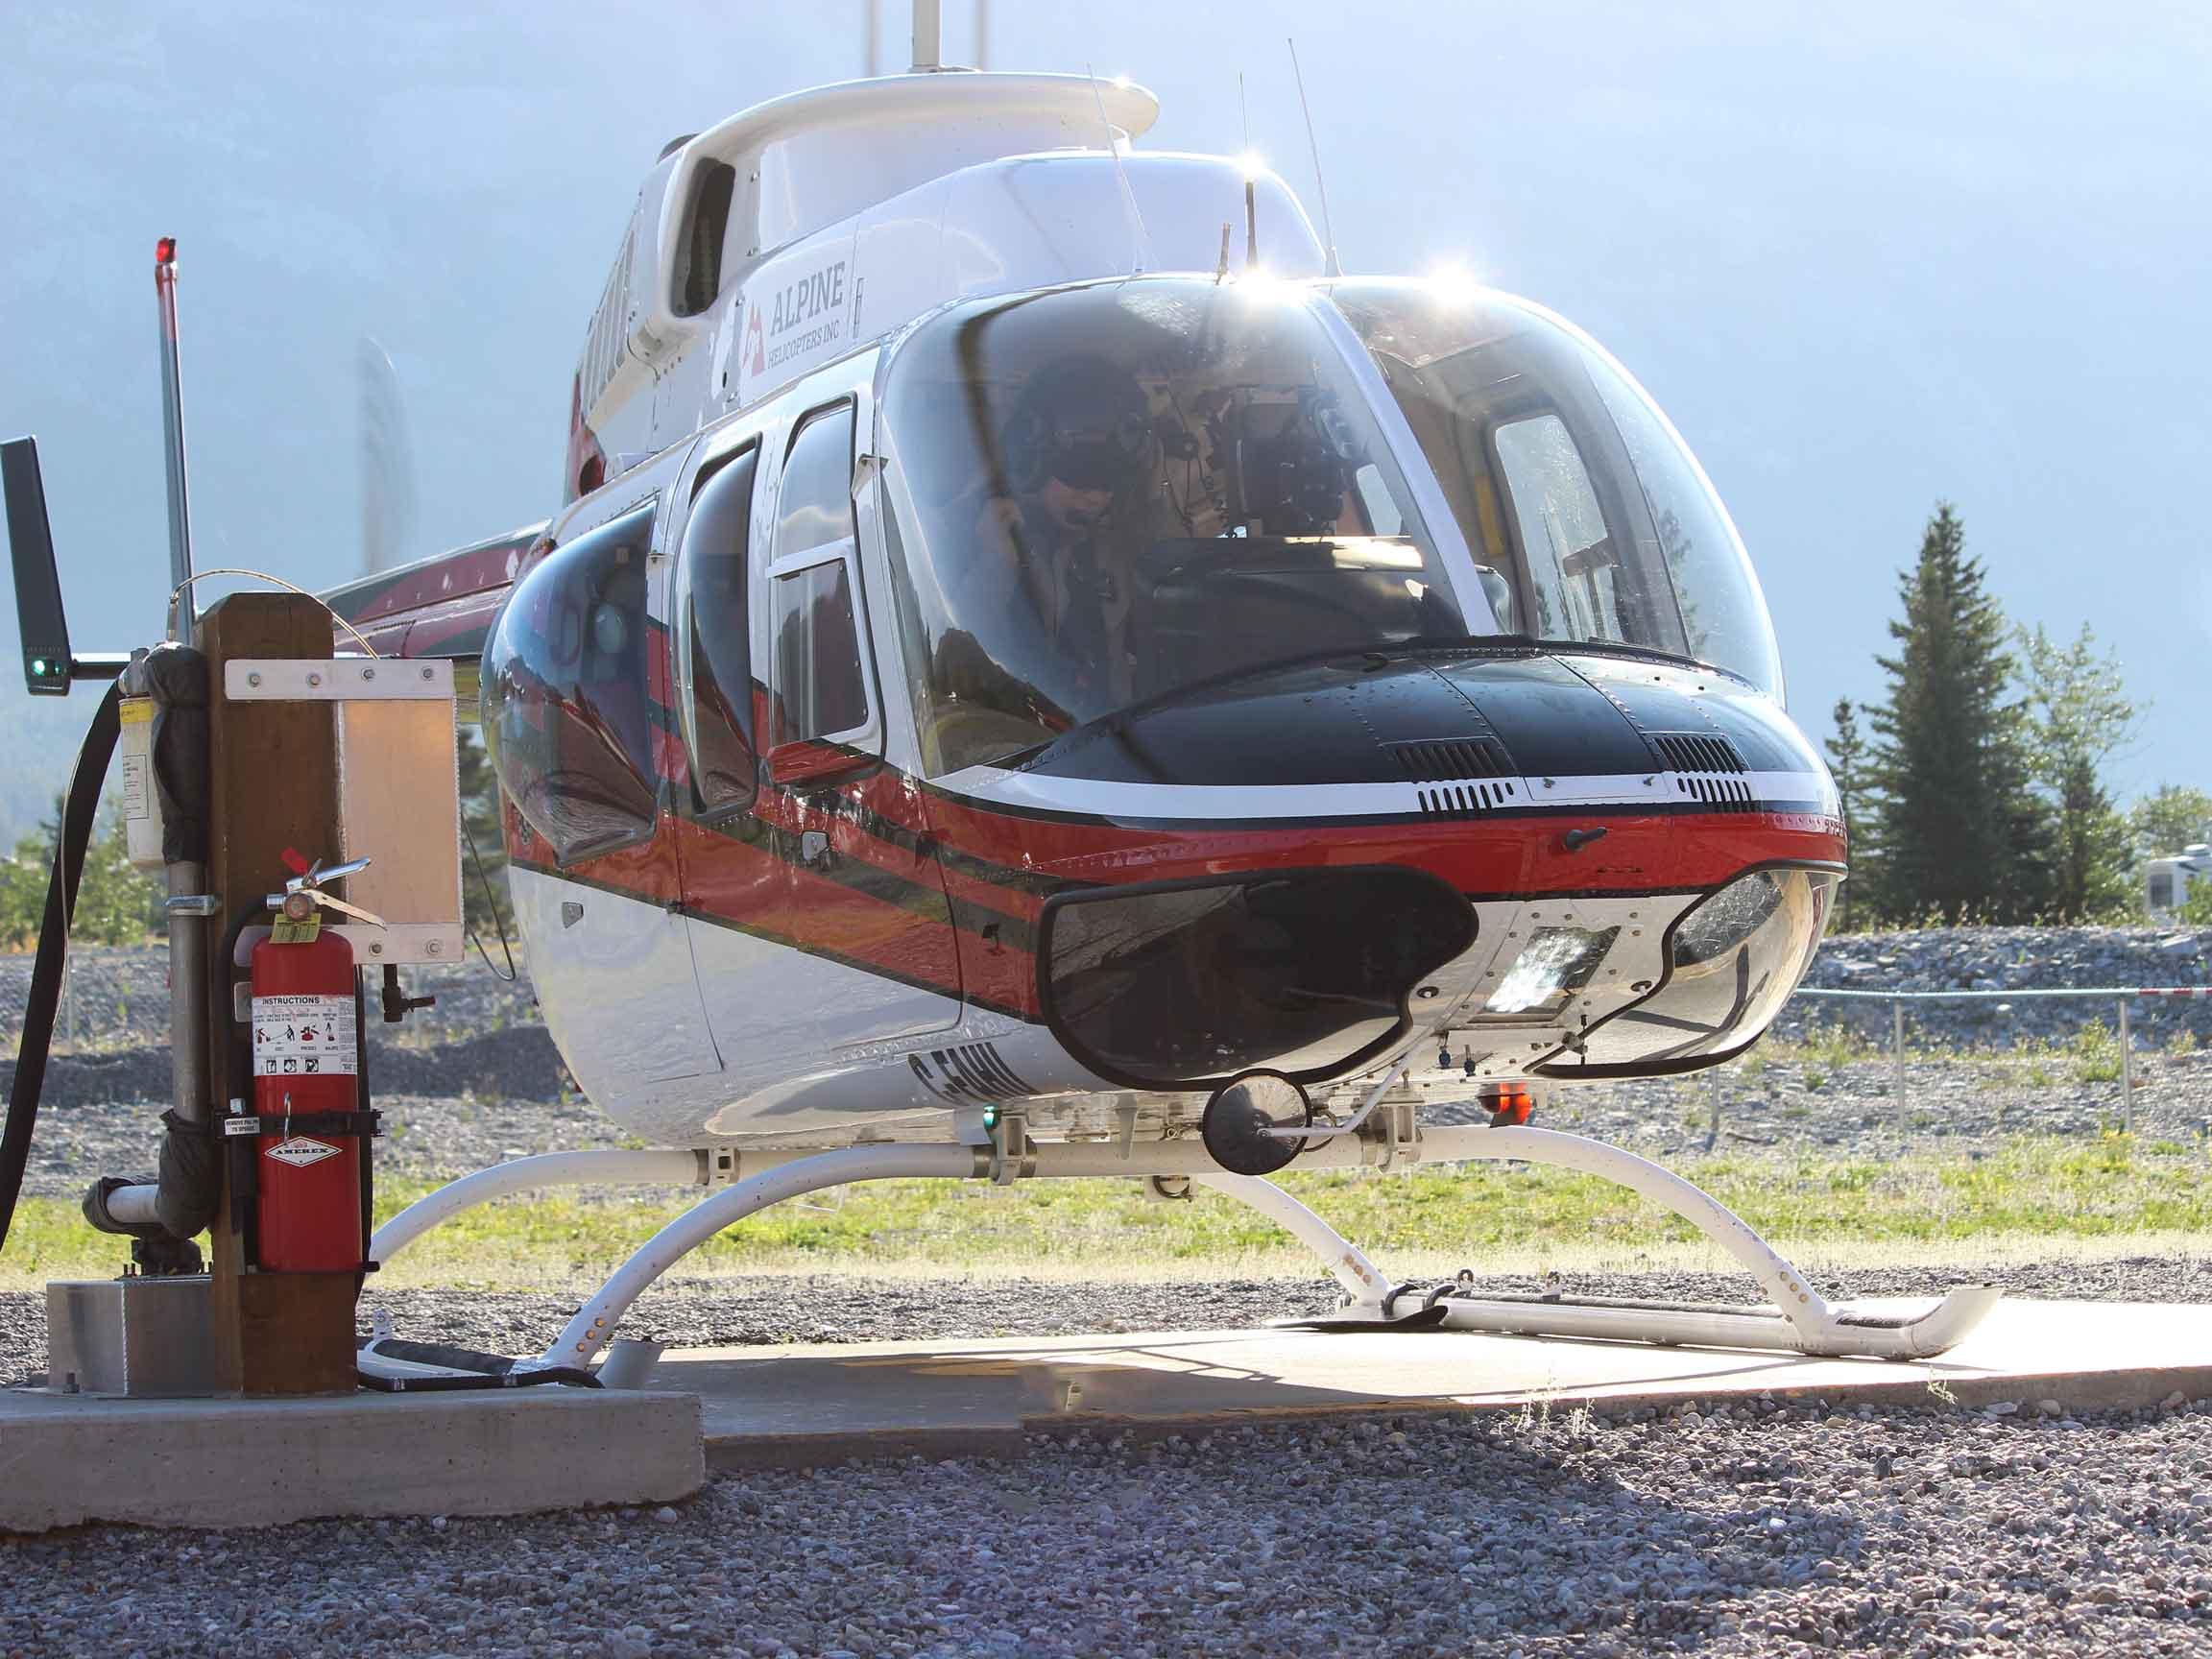 Take Flight on a White Mountain Adventures Heli-Hike